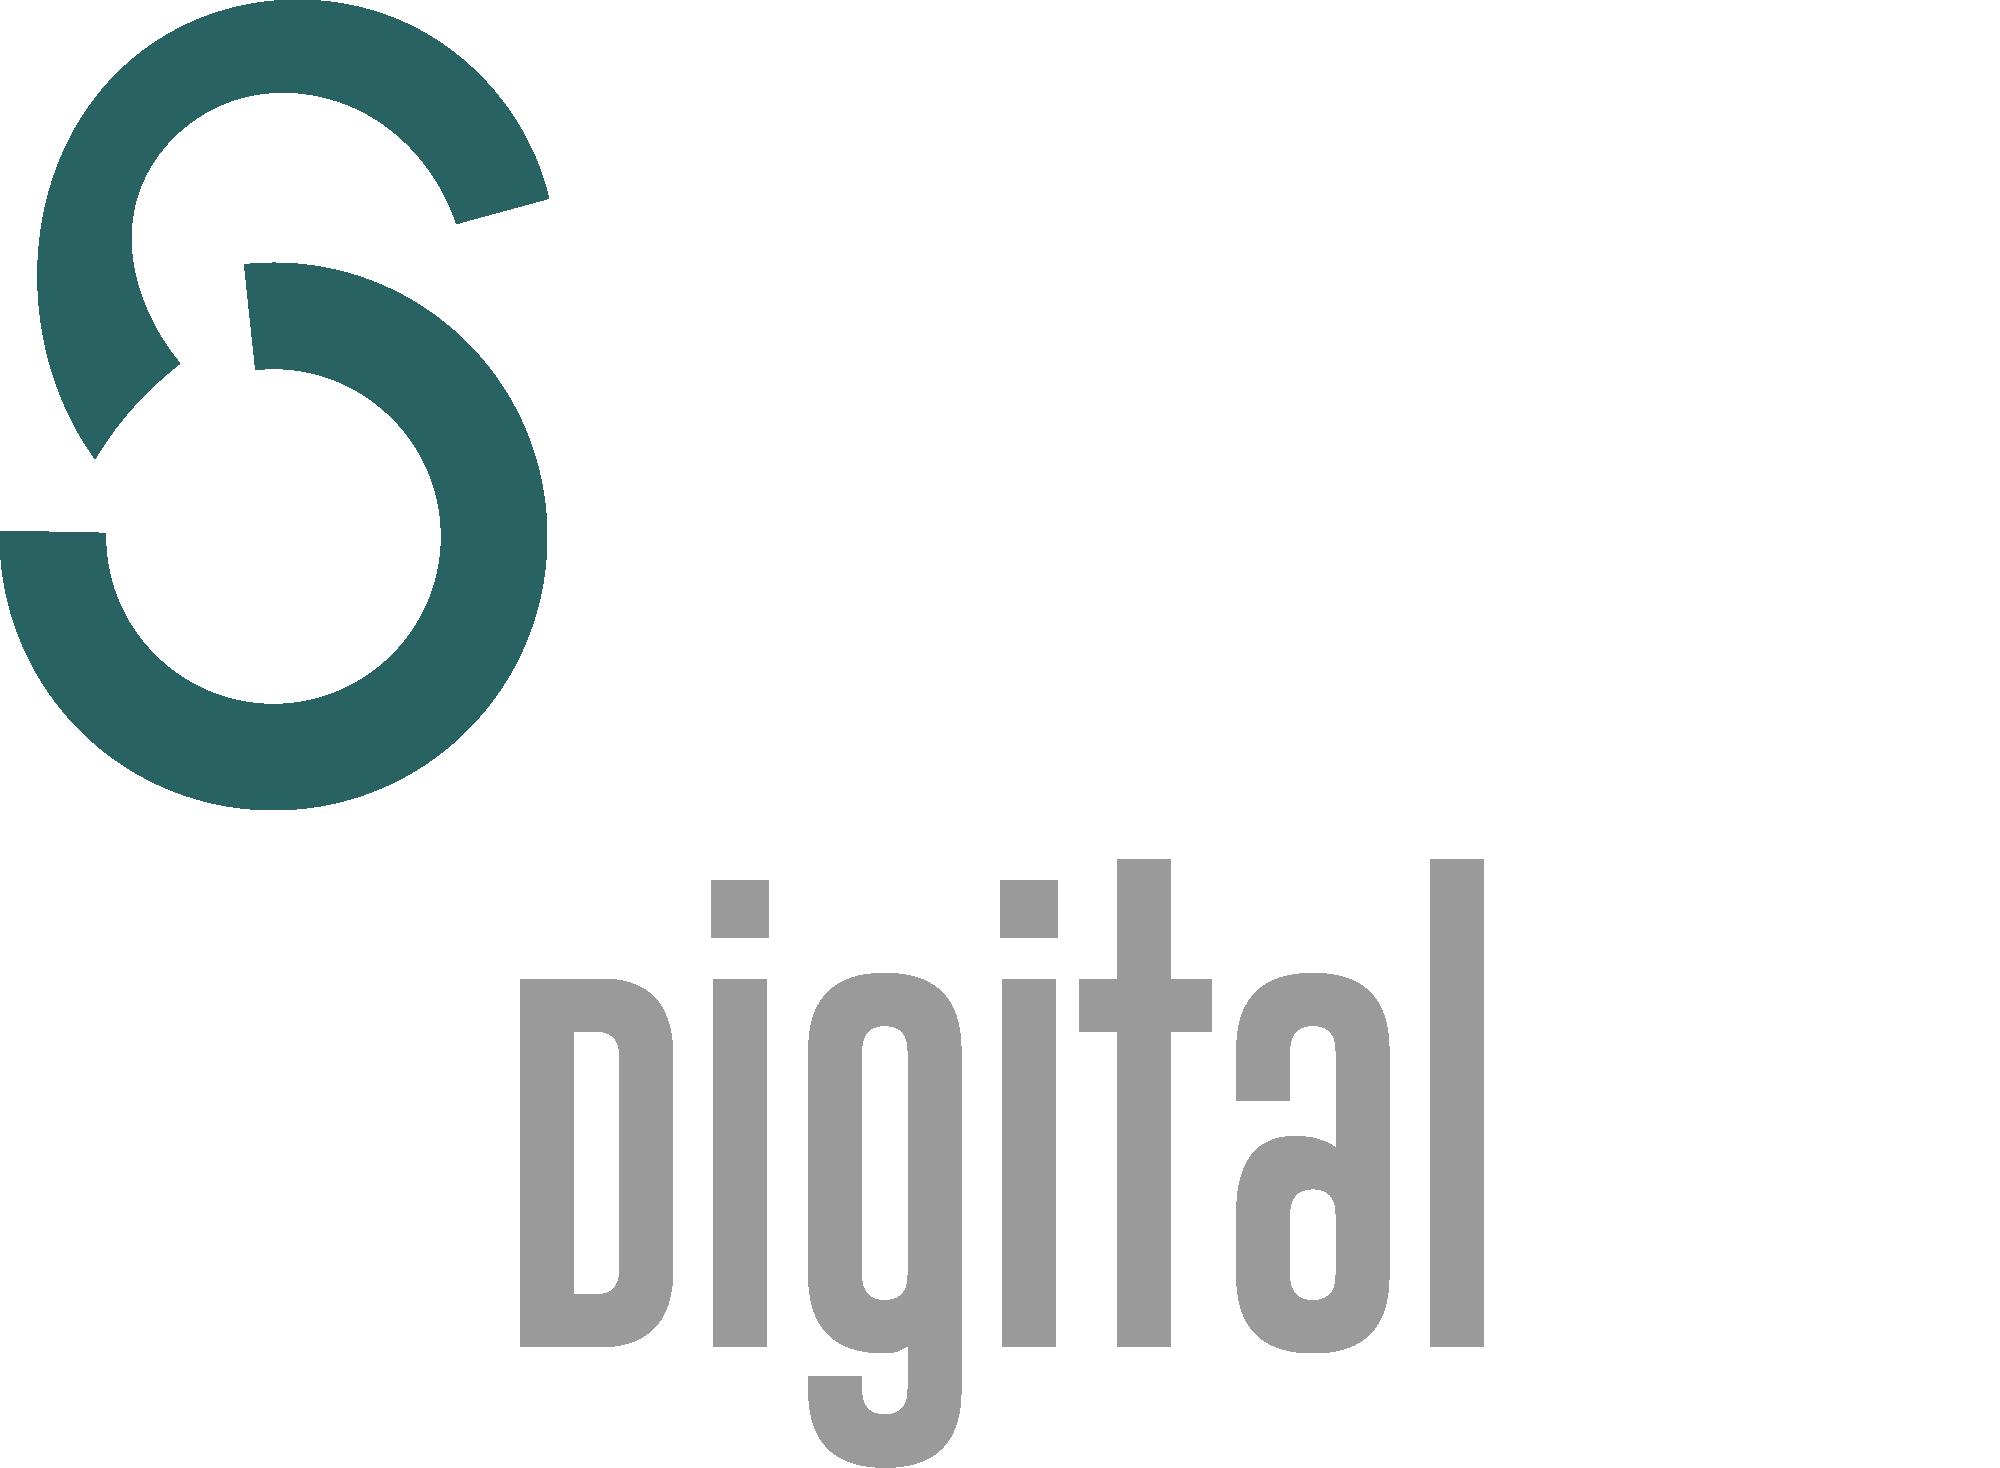 Sambito Digital